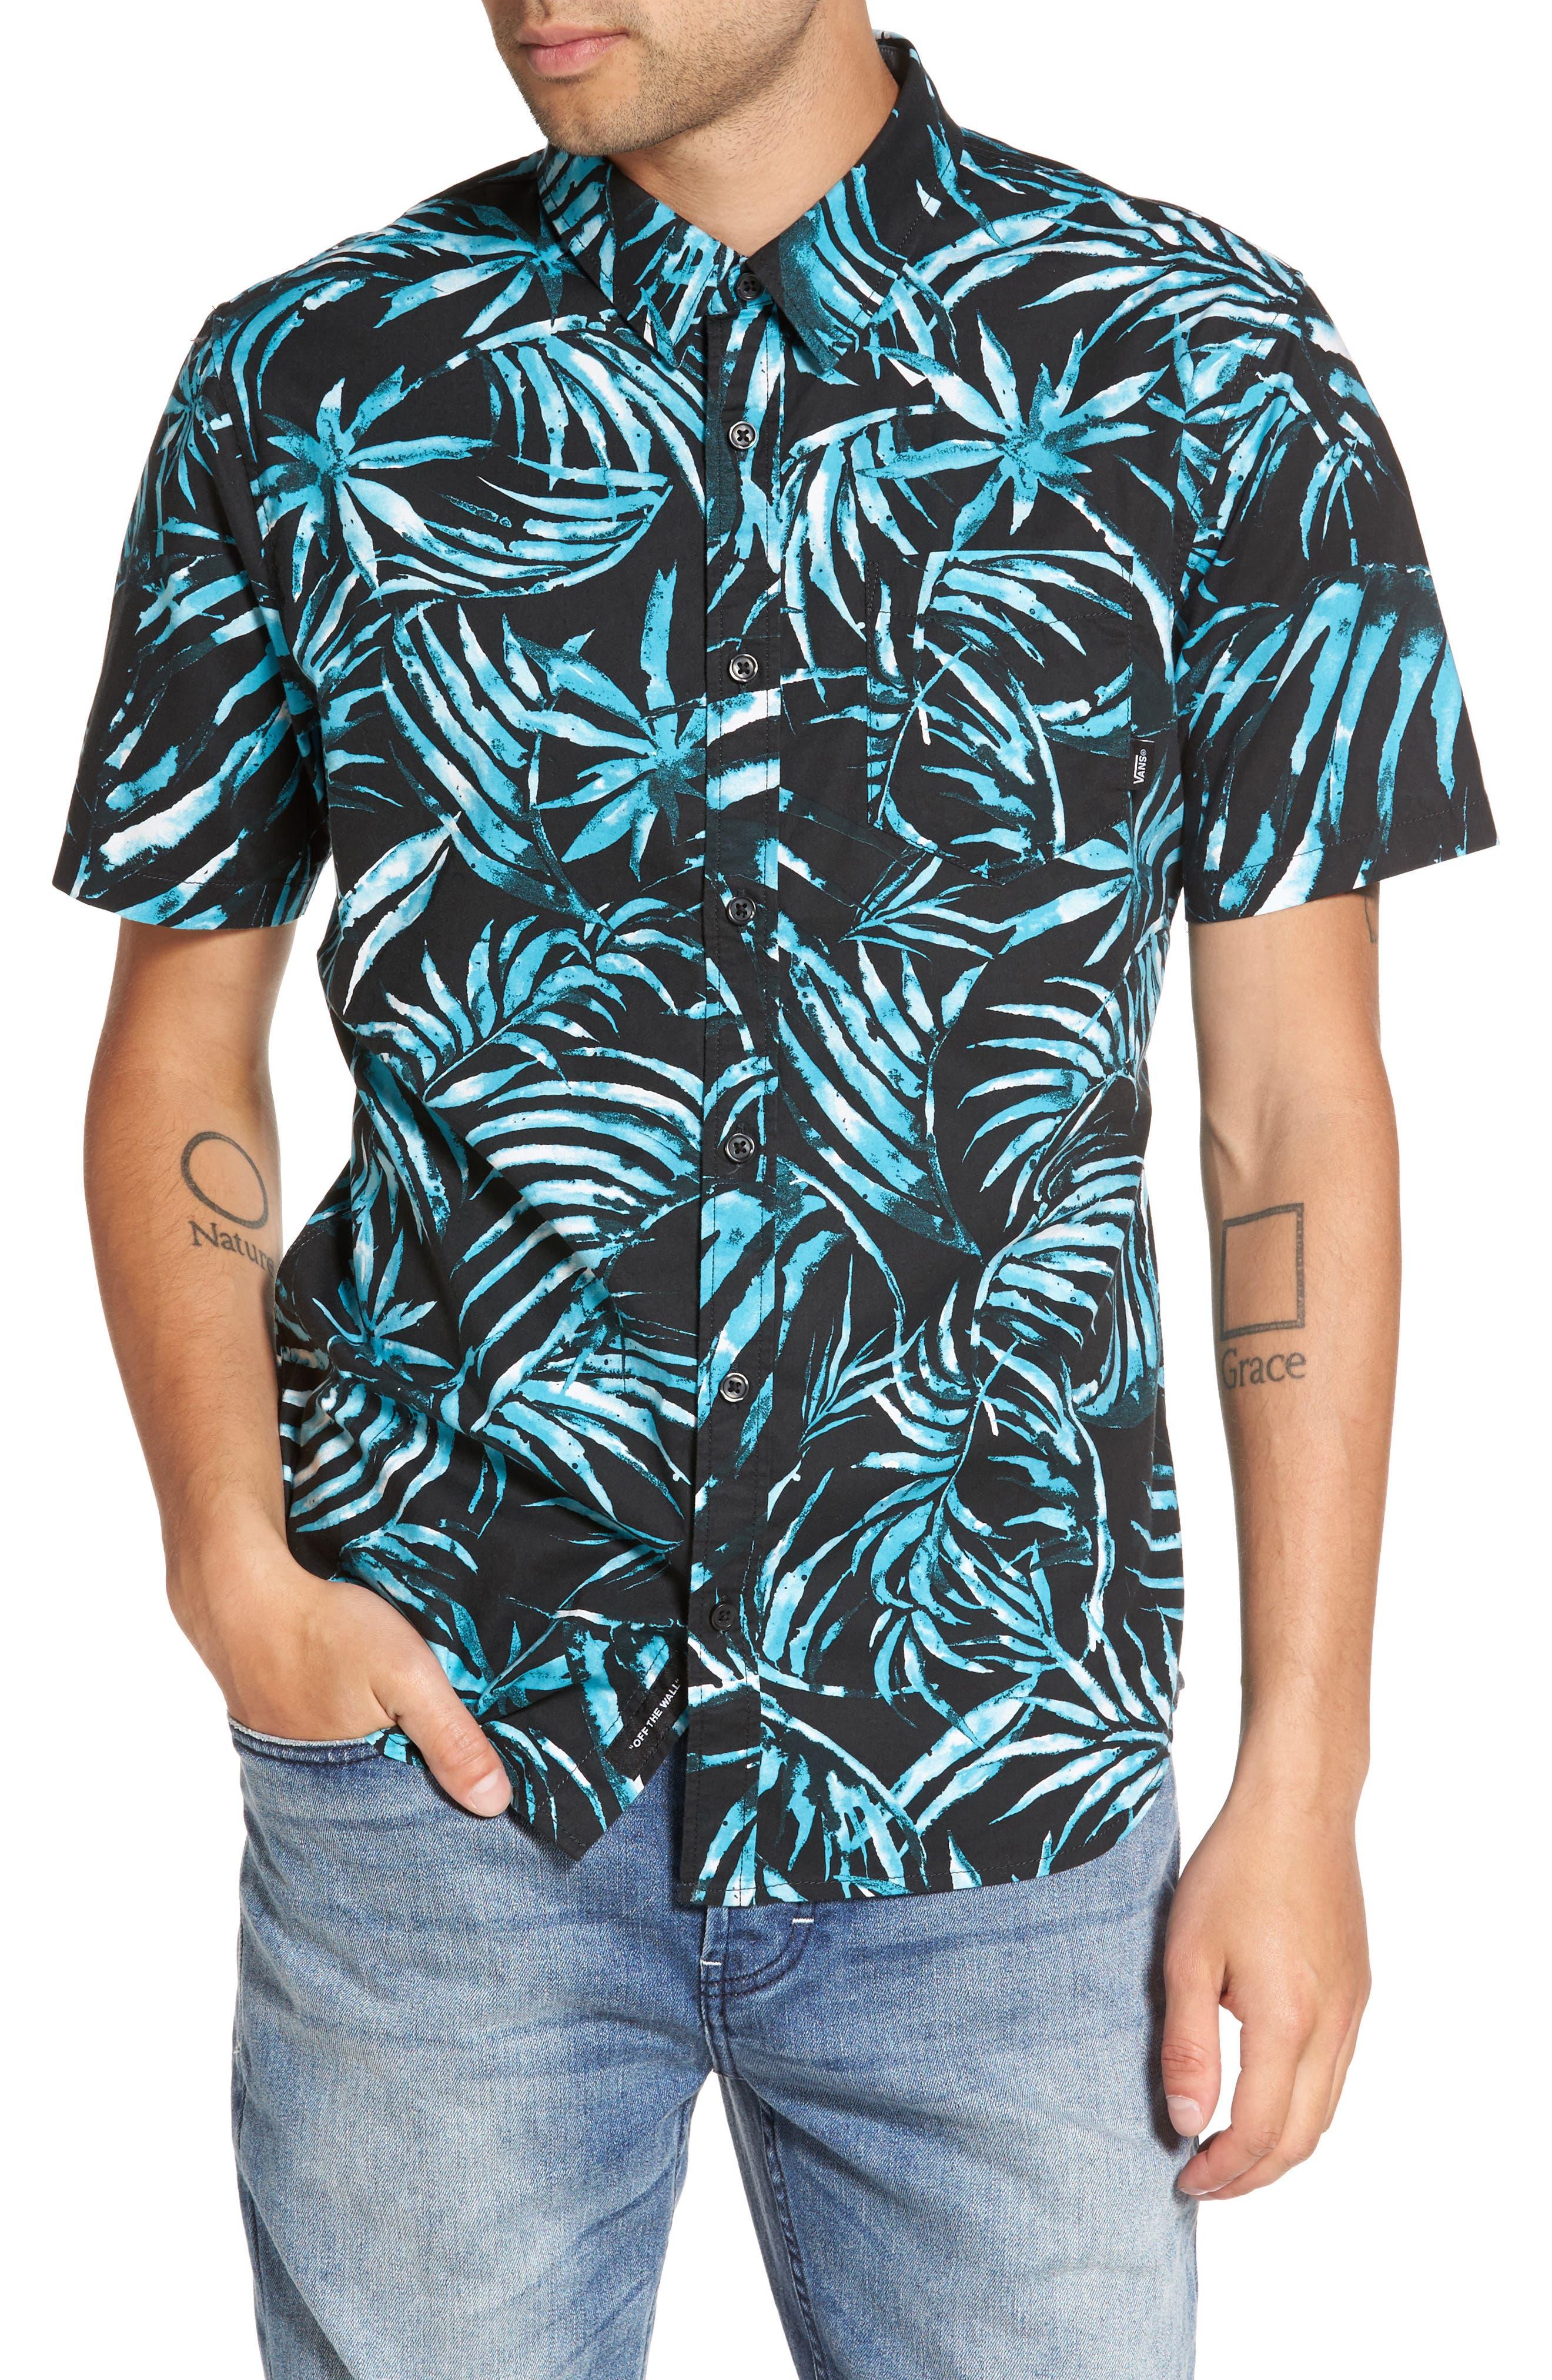 Vans Del Playa Palm Print Woven Shirt